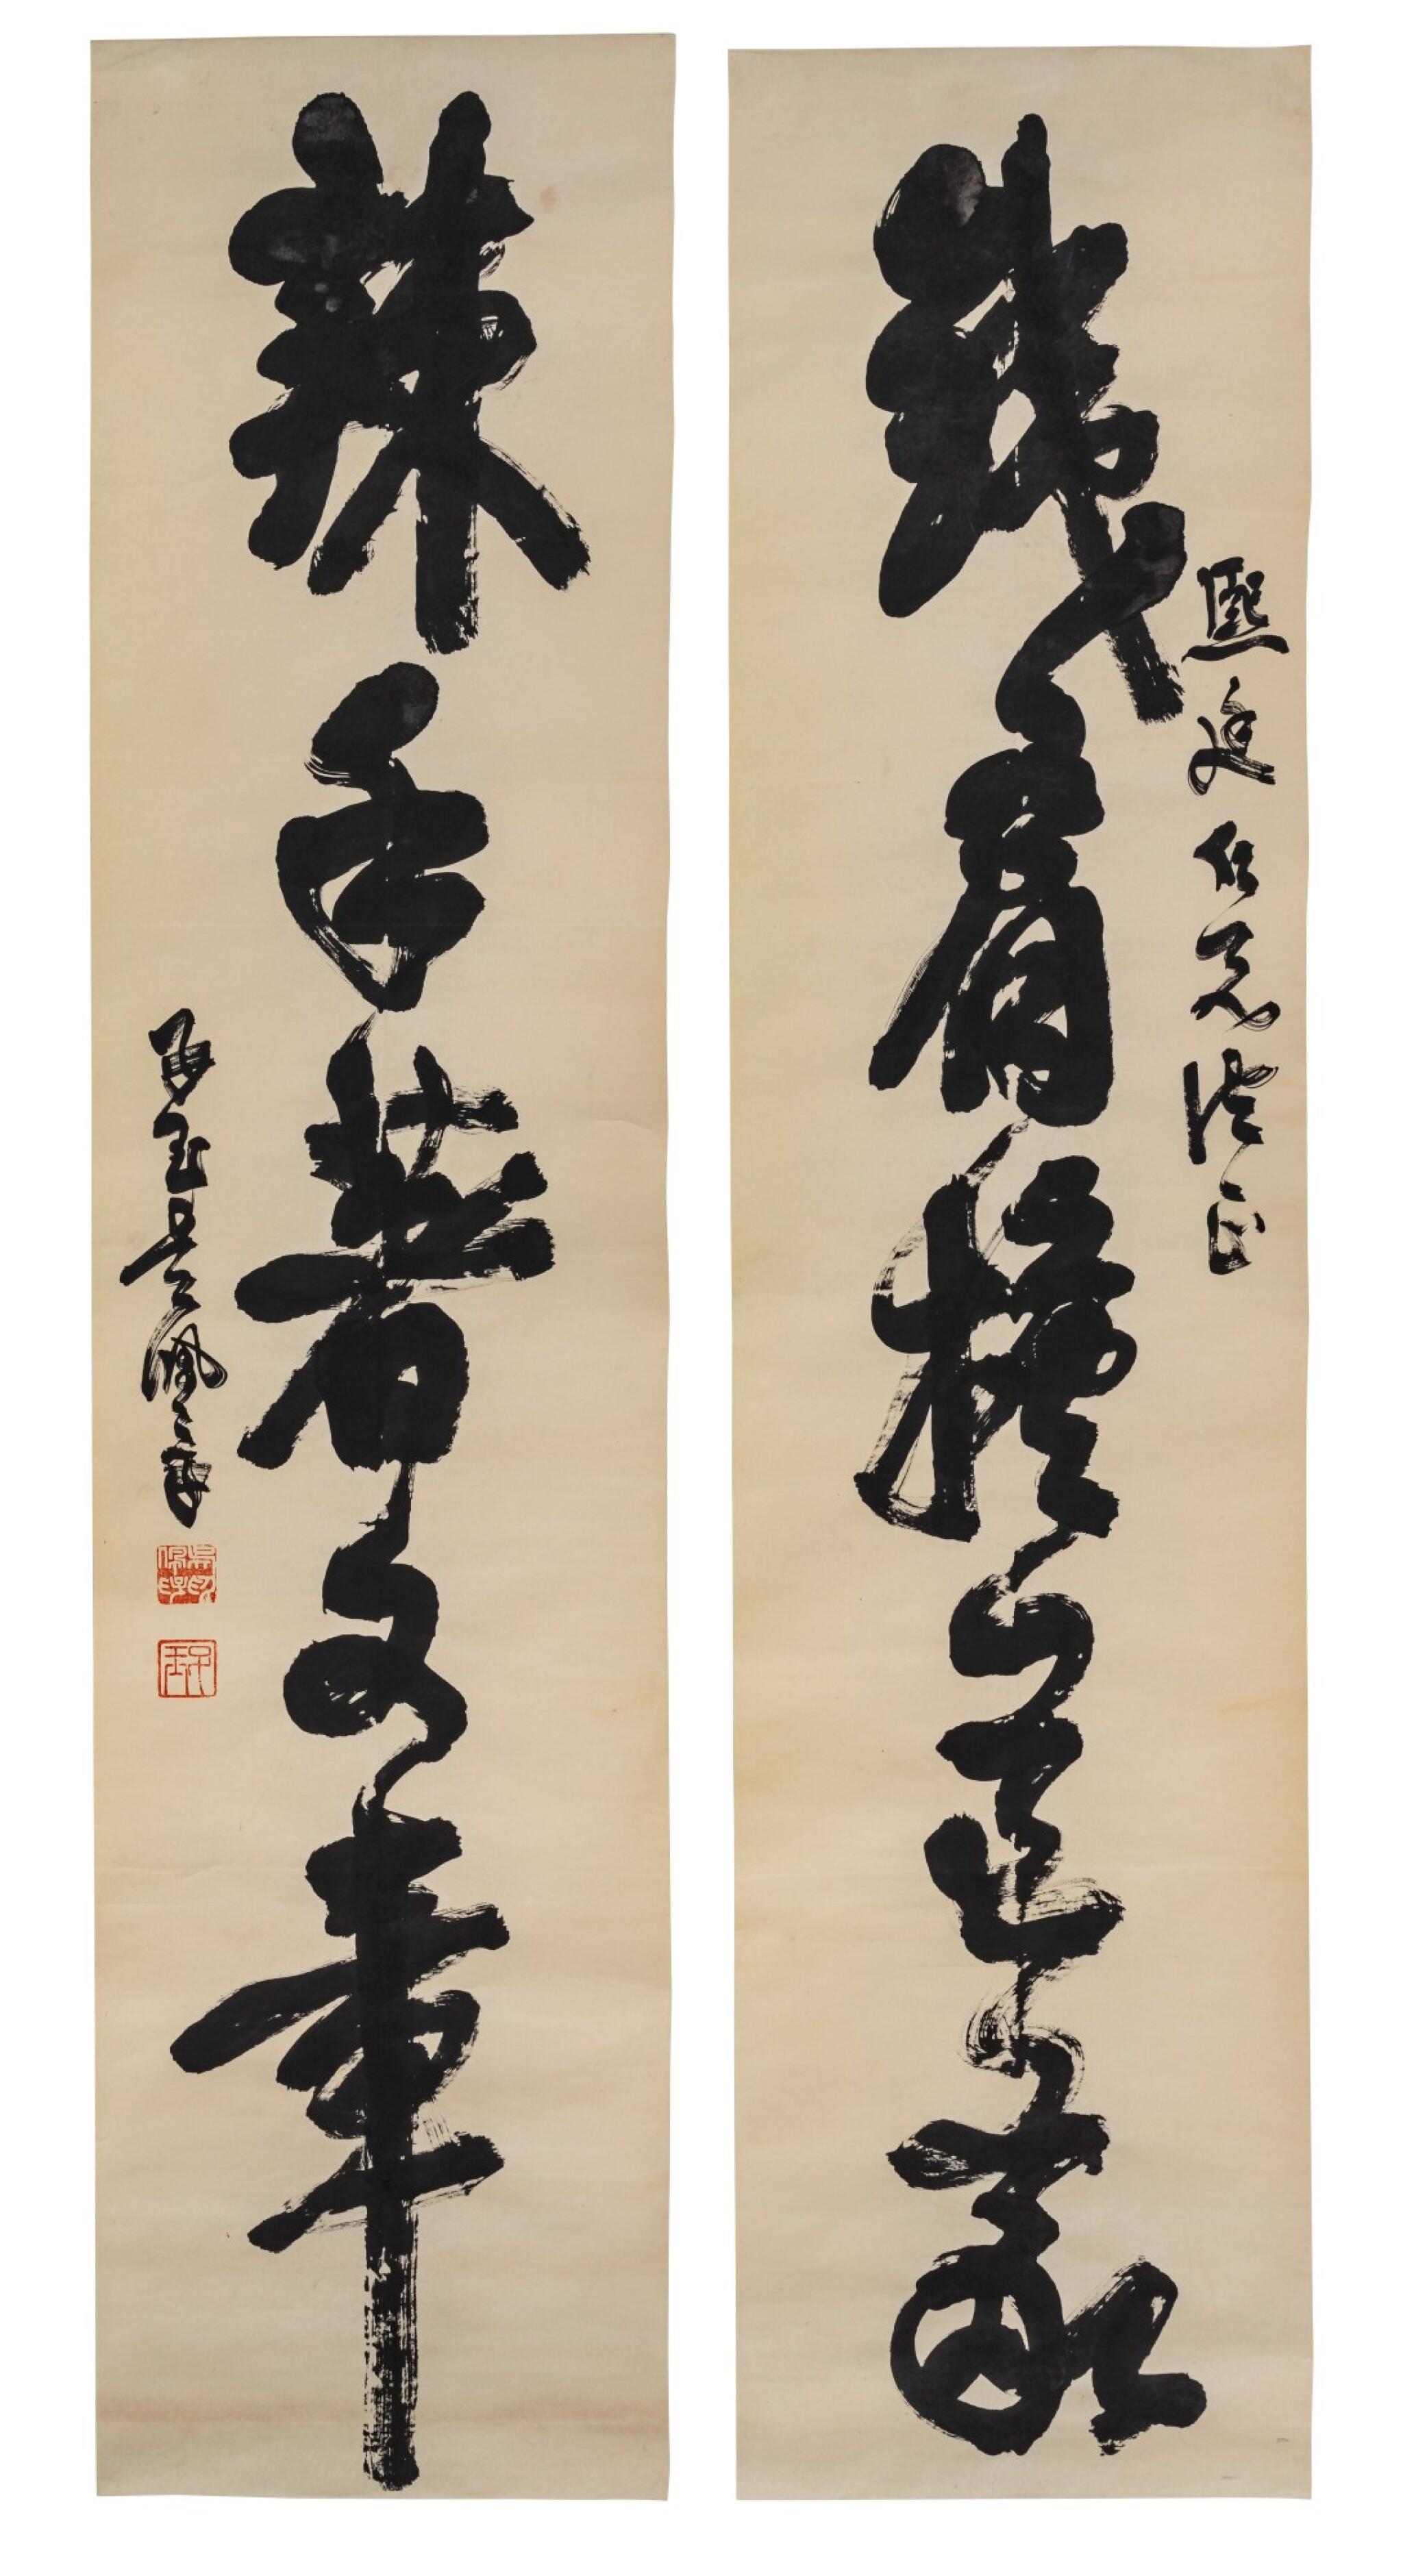 View 1 of Lot 133. Wu Peifu (1874-1939) Couplet de calligraphies de style d'herbe   吳佩孚 草書五言聯   Wu Peifu (1874-1939) Calligraphy Couplet in Cursive Script.